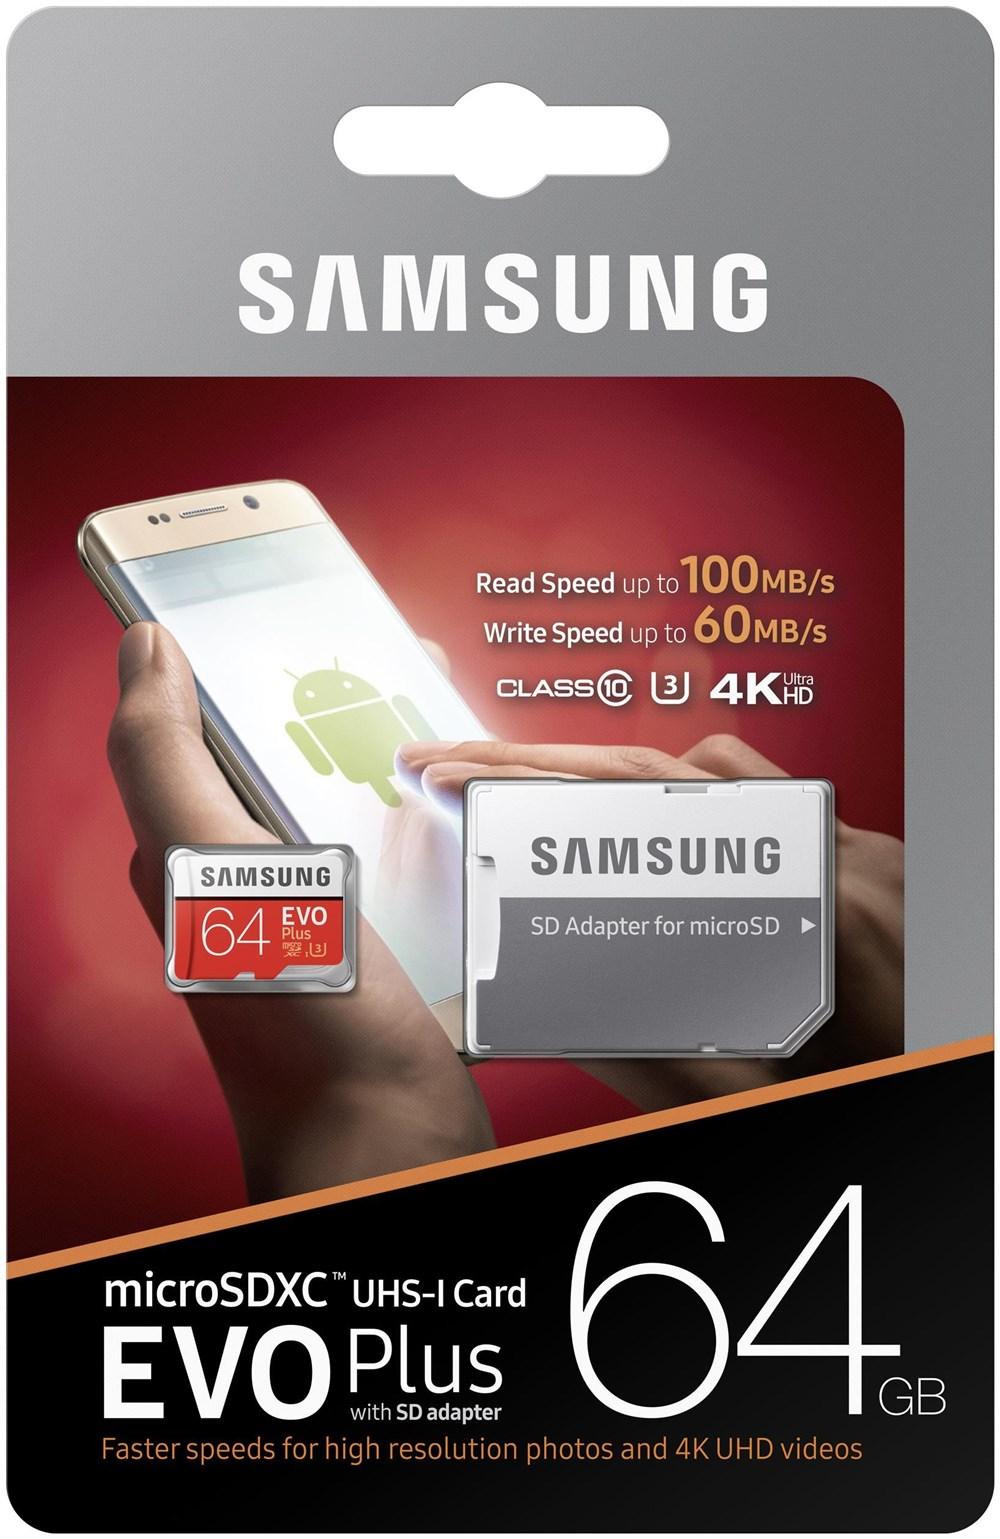 Card memorie Samsung microSDHC Evo+ 2017 MB-MC64GA/EU 64 GB clasa 10 UHS-1 + adaptor